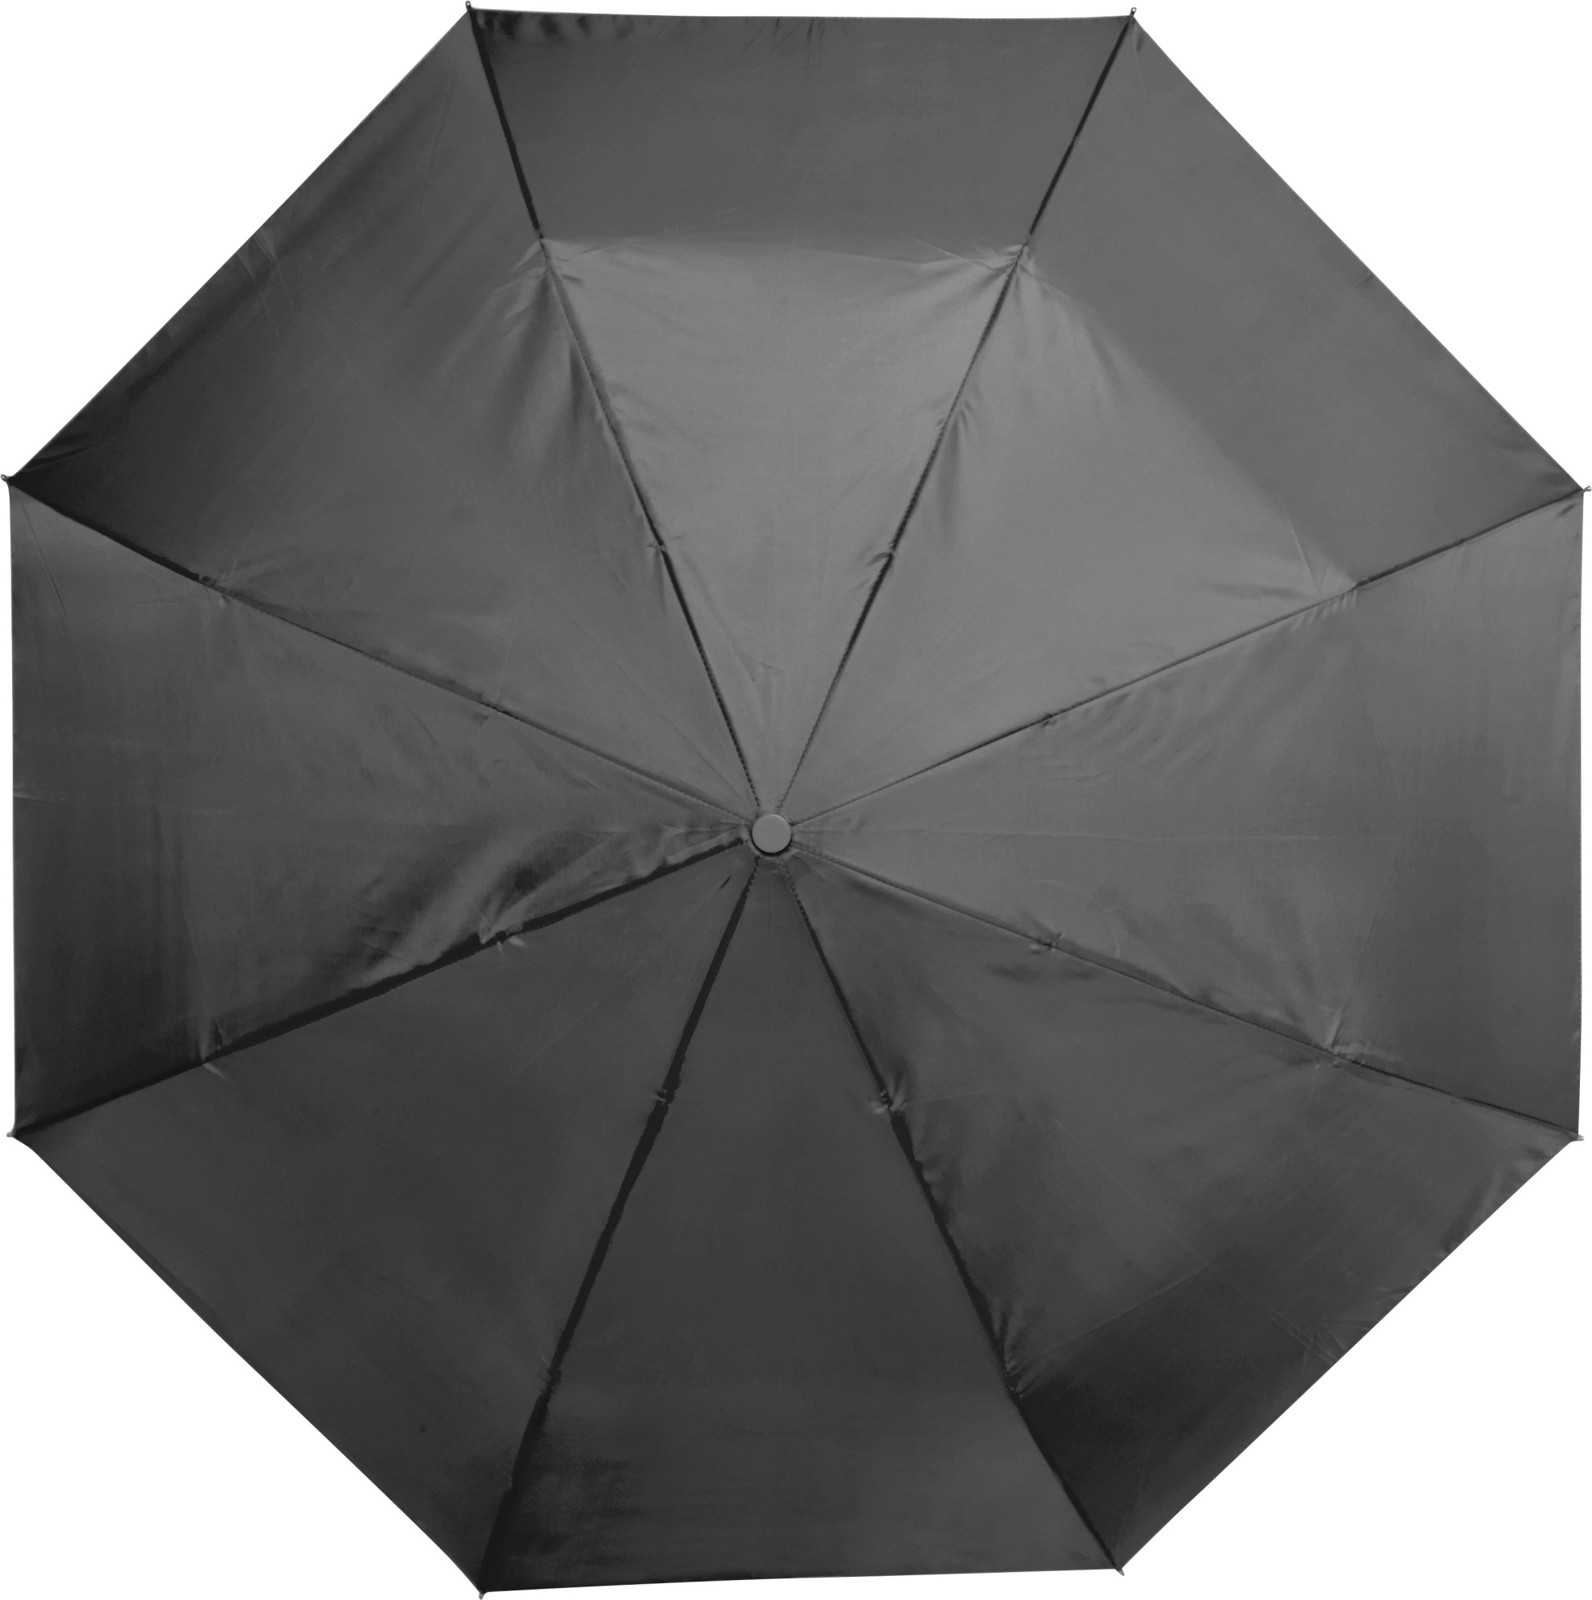 Polyester umbrella - Black